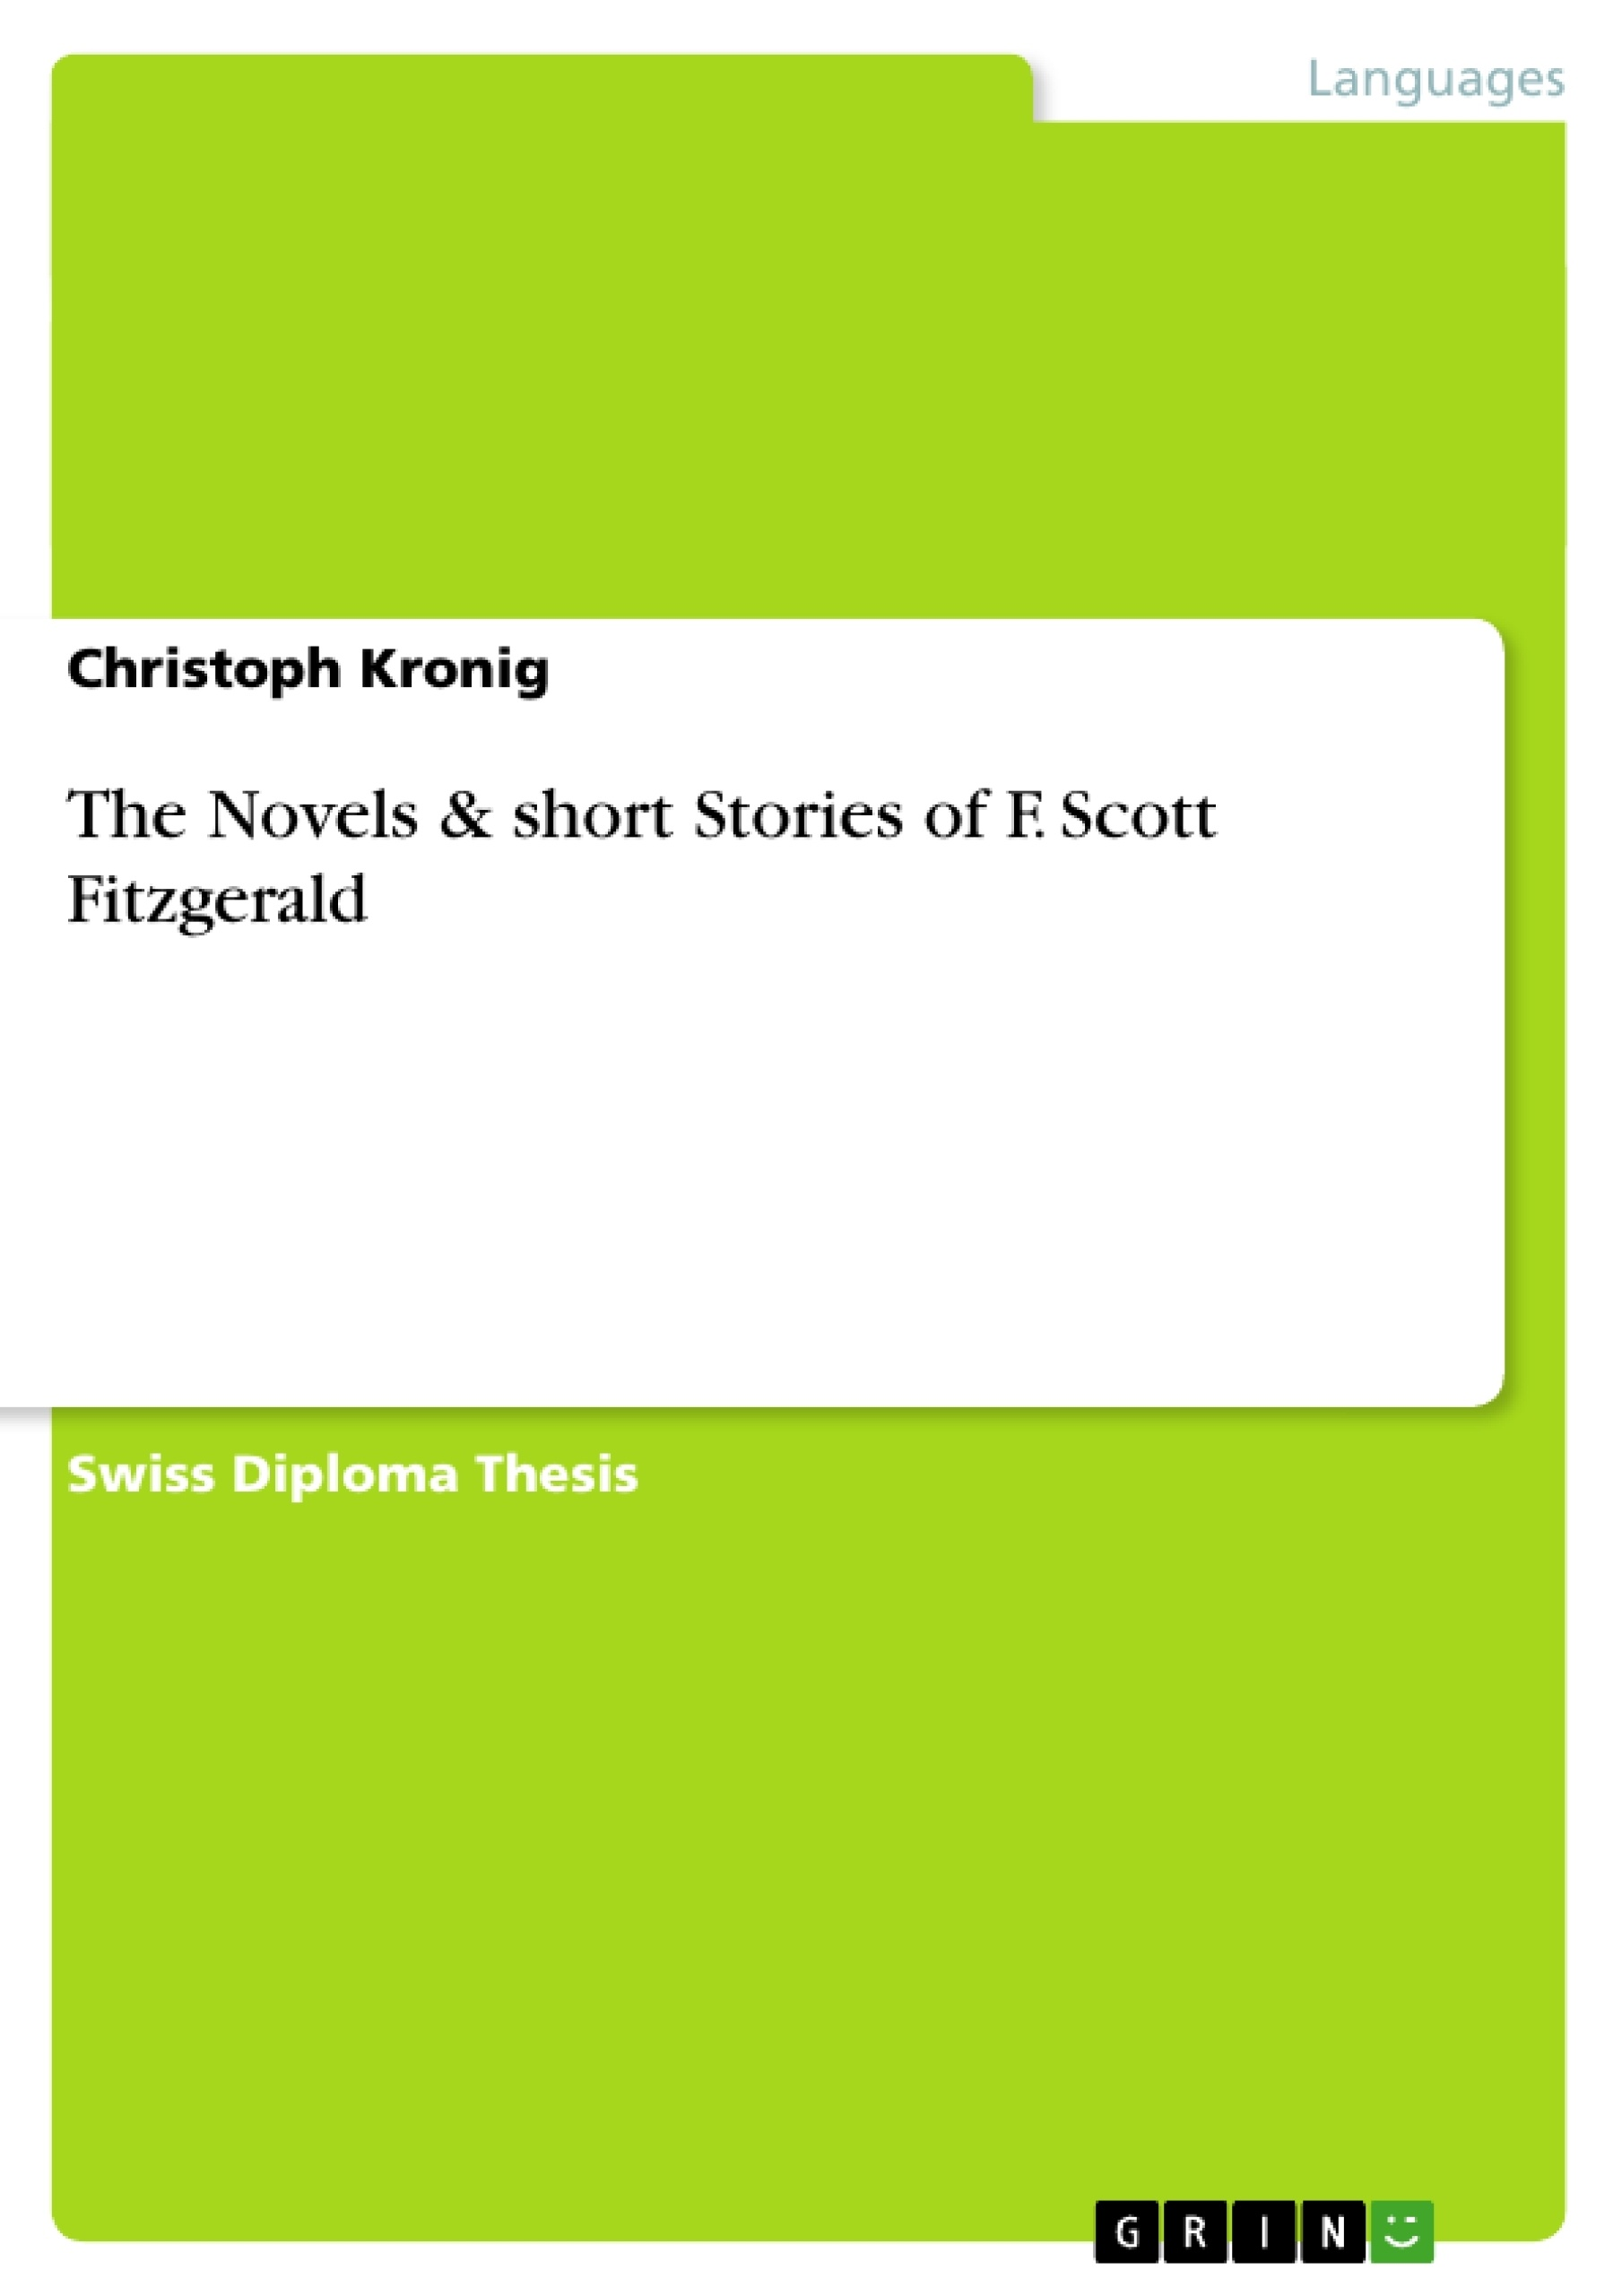 Title: The Novels & short Stories of F. Scott Fitzgerald